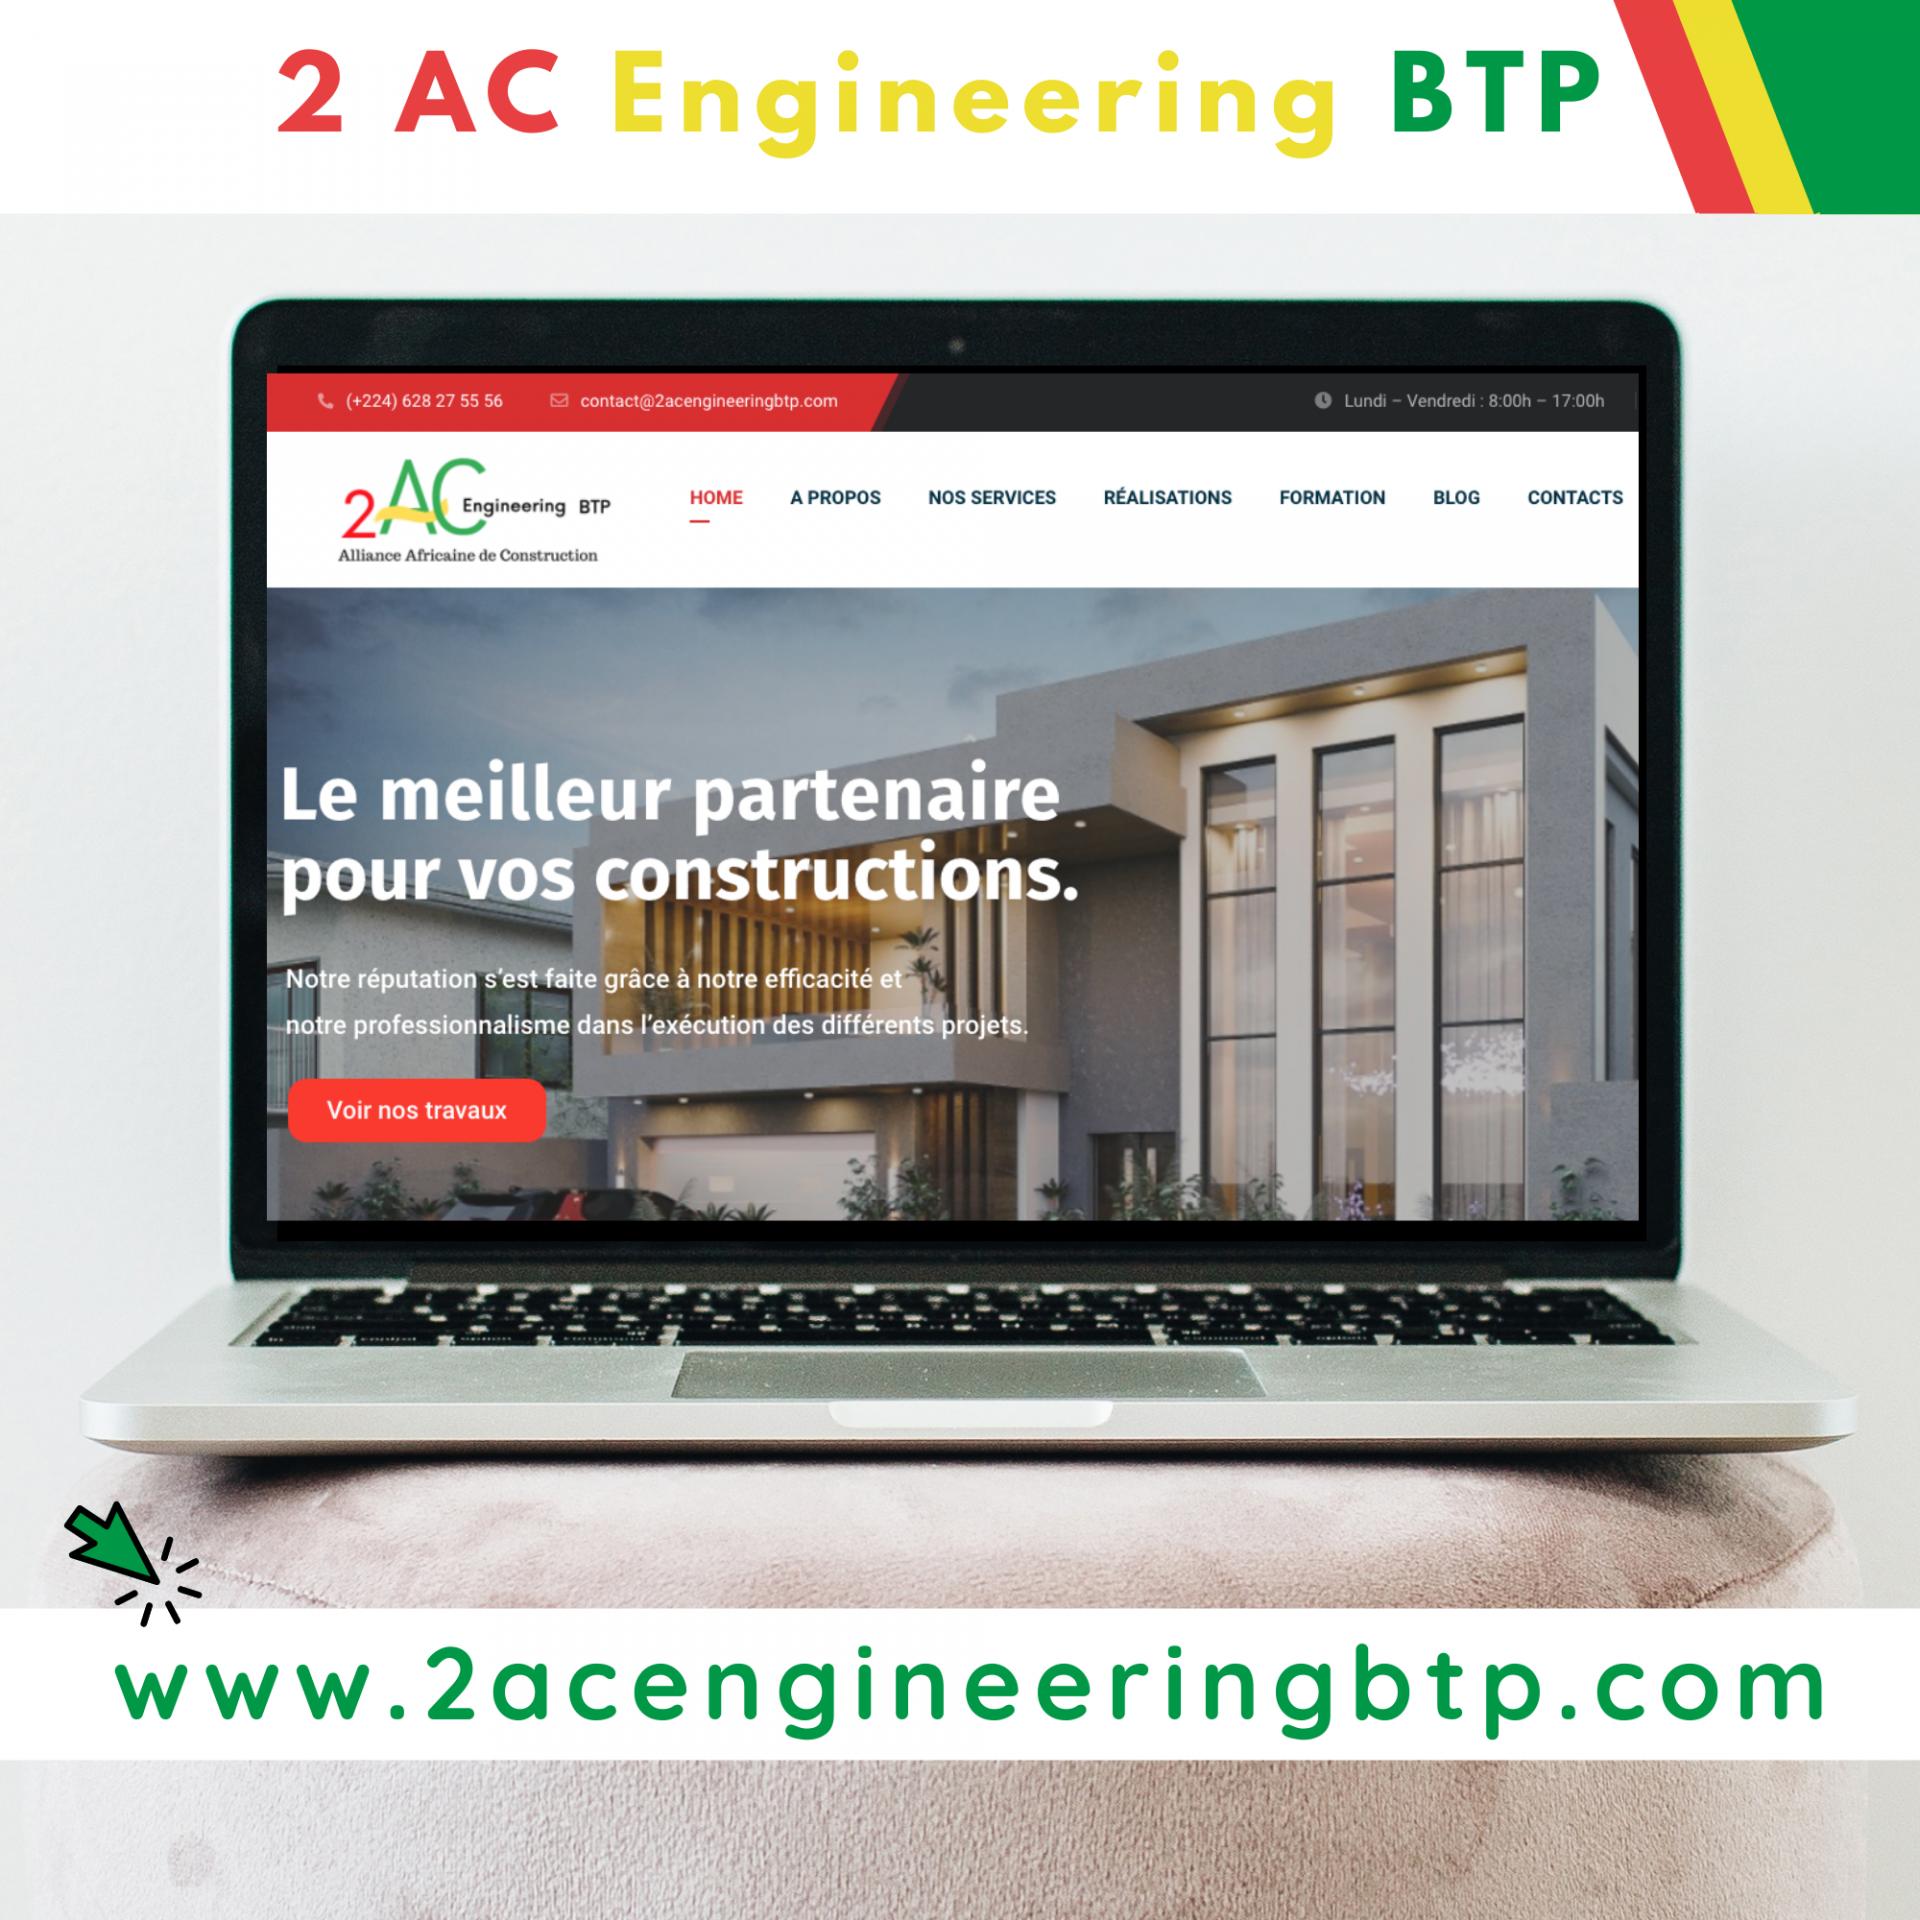 Projet 2AC Engineering BTP